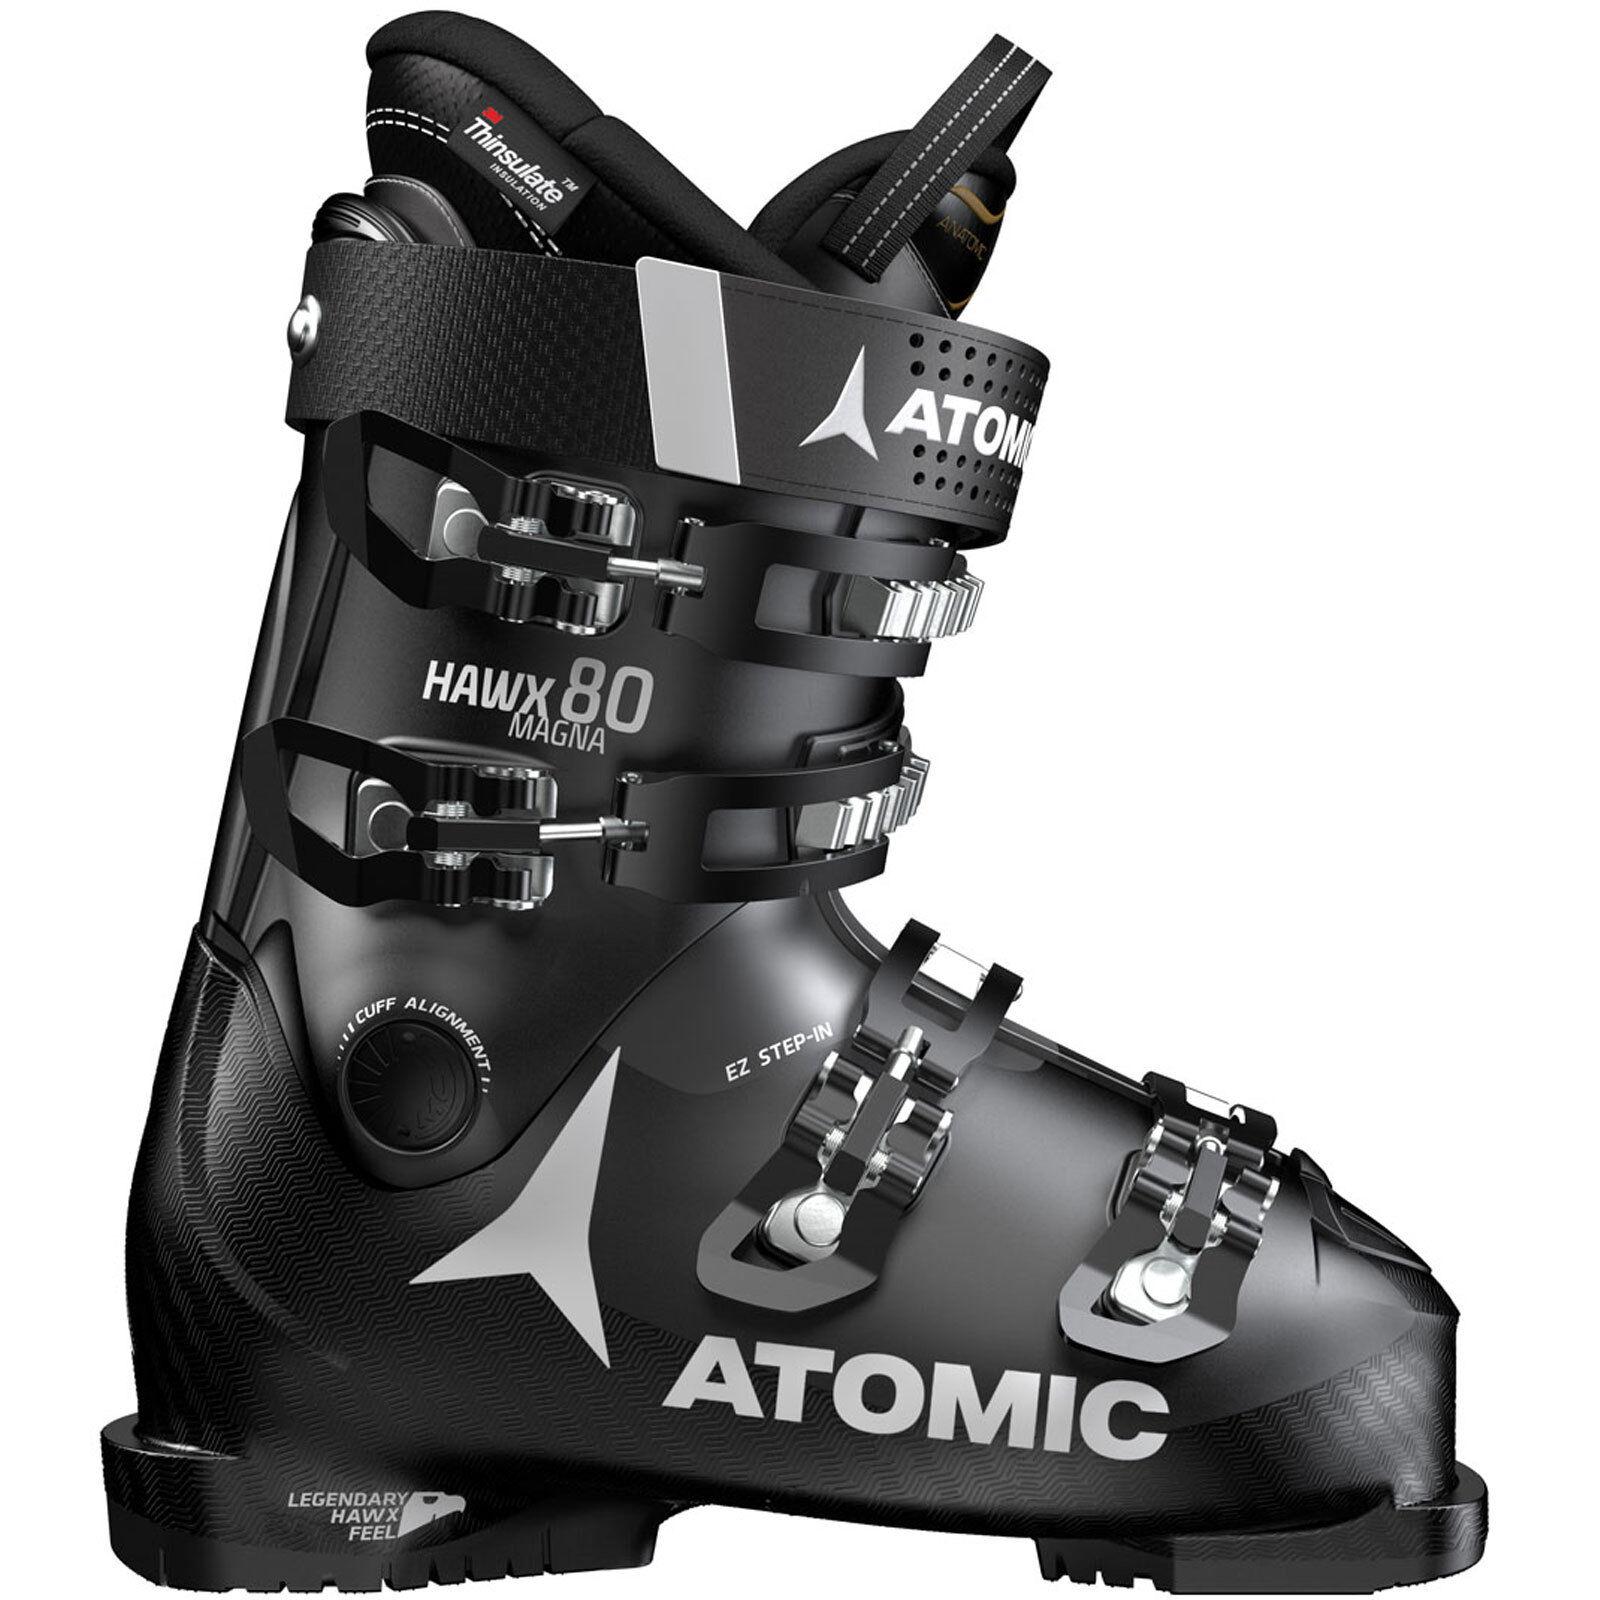 Atomic Hawx Magna 80 Herren-Skistiefel All All All Mountain Skischuhe Stiefel Ski Stiefel e55034